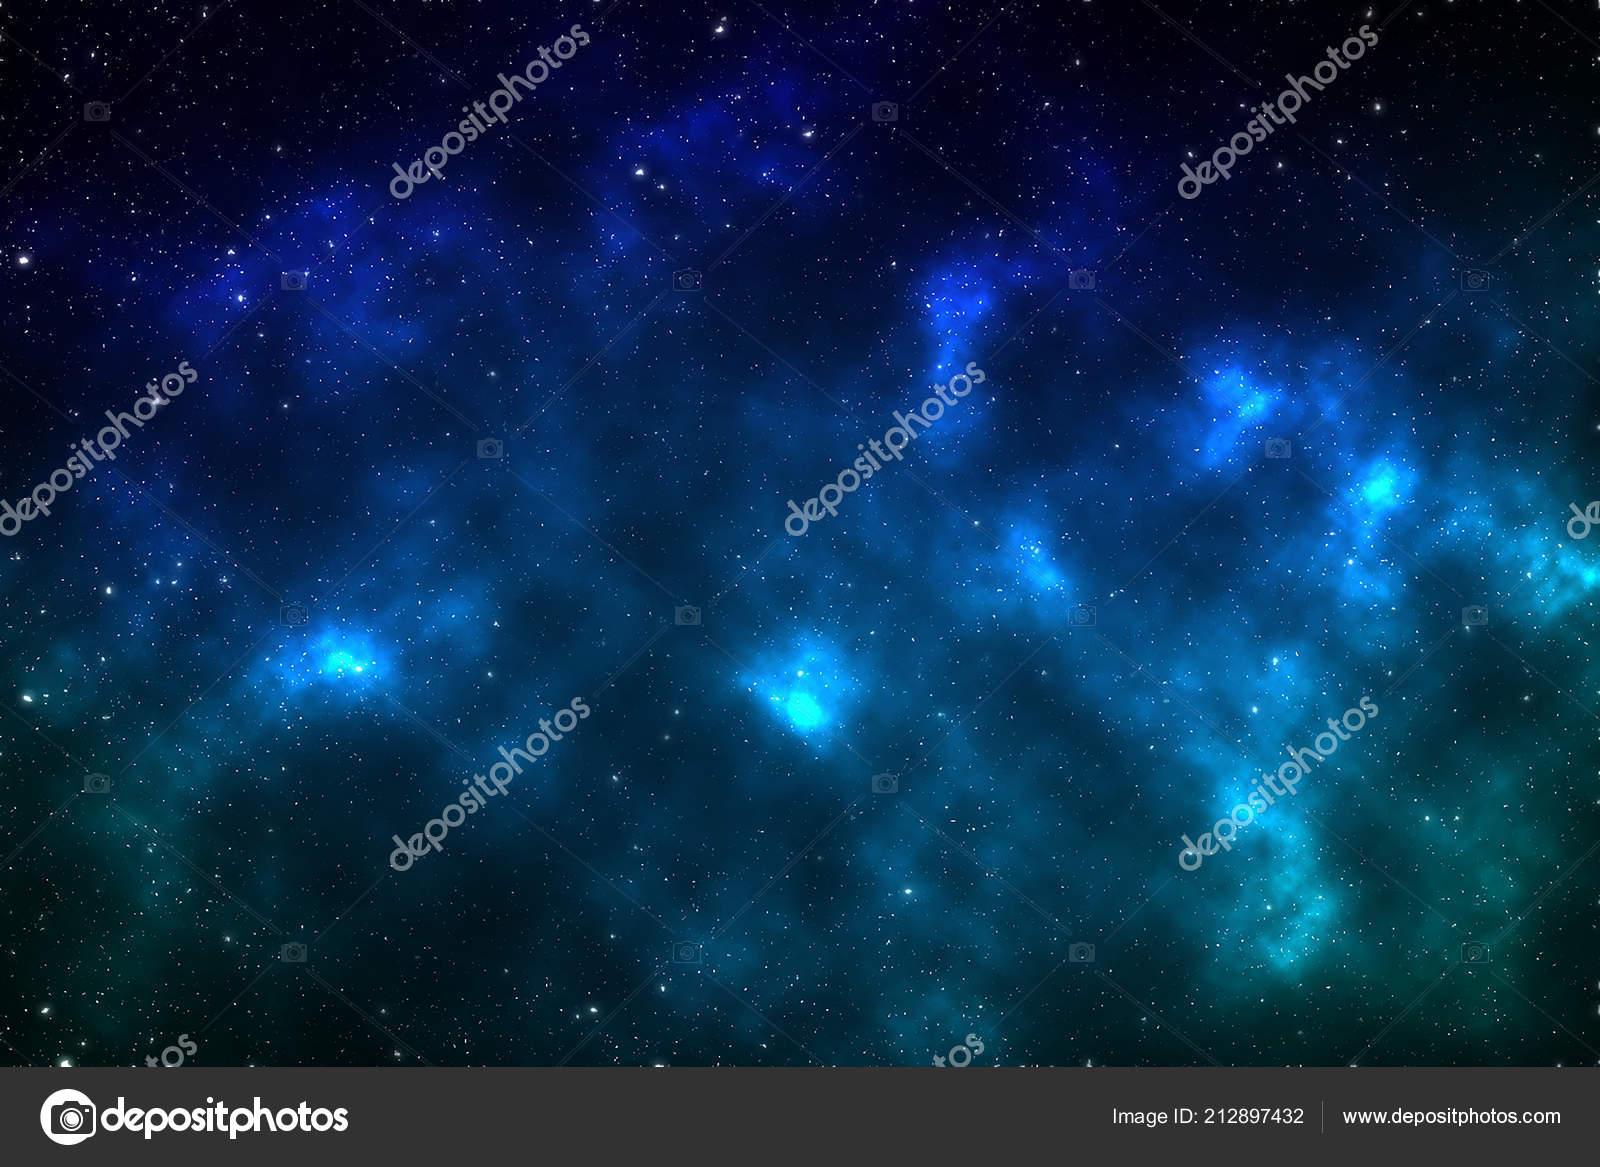 Galaxy Ile Soyut Uzay Arka Plan Stok Foto Grebeshkovmaxim At Gmail